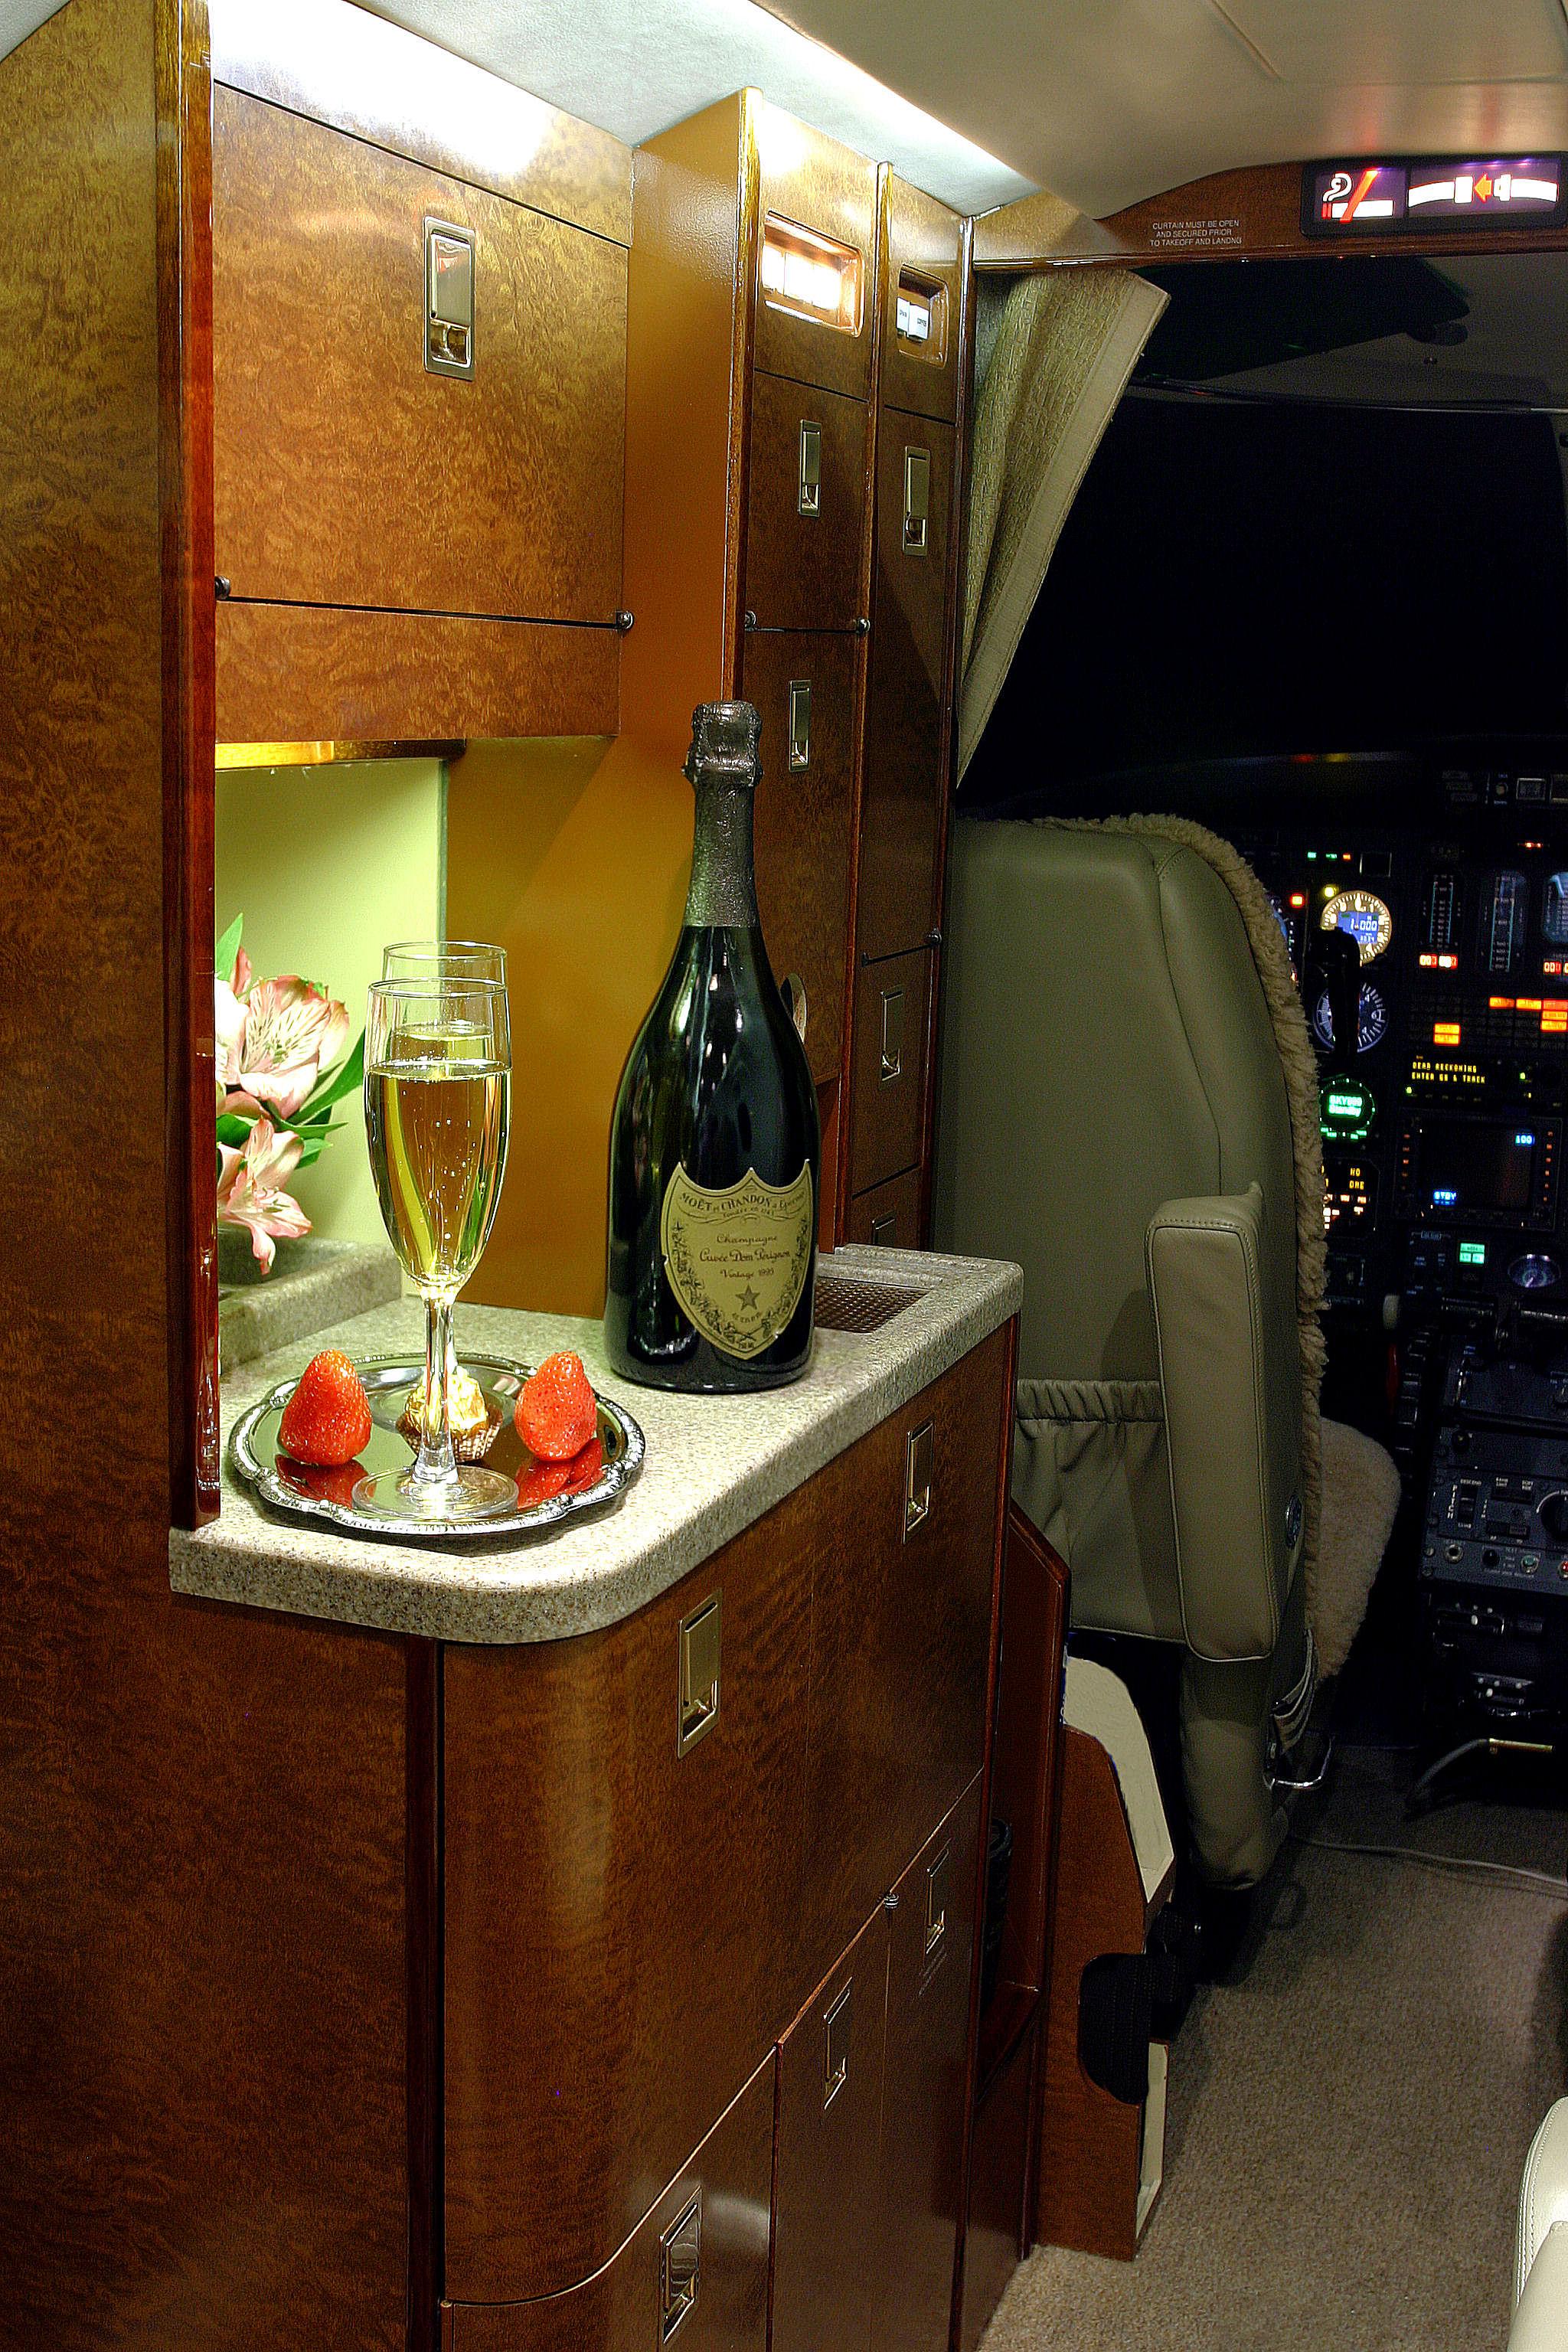 DuPage Airport Charter, Palwaukee Charter, Aurora Jet Charter, Waukegan Airport Jet Charter, Midway Jet Charter, O'Hare Jet Charter, Joliet Charter